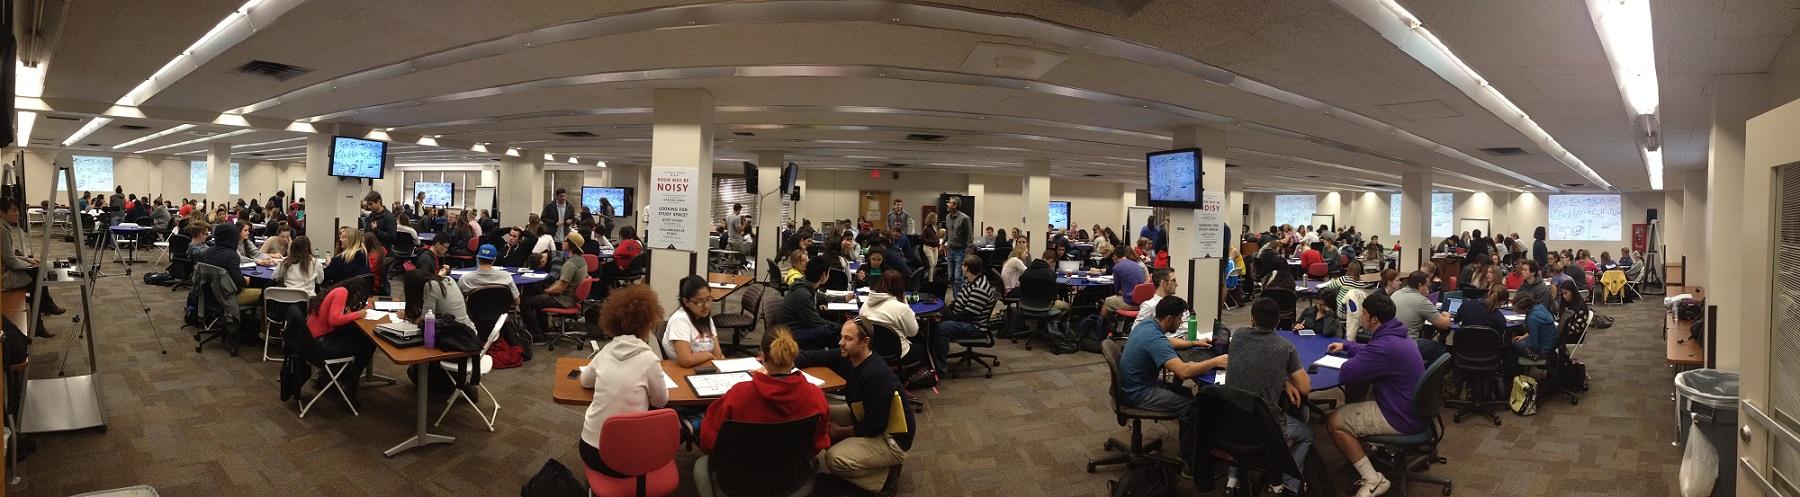 Image of a collaborative classroom from UA AAU Undergraduate STEM Education Project